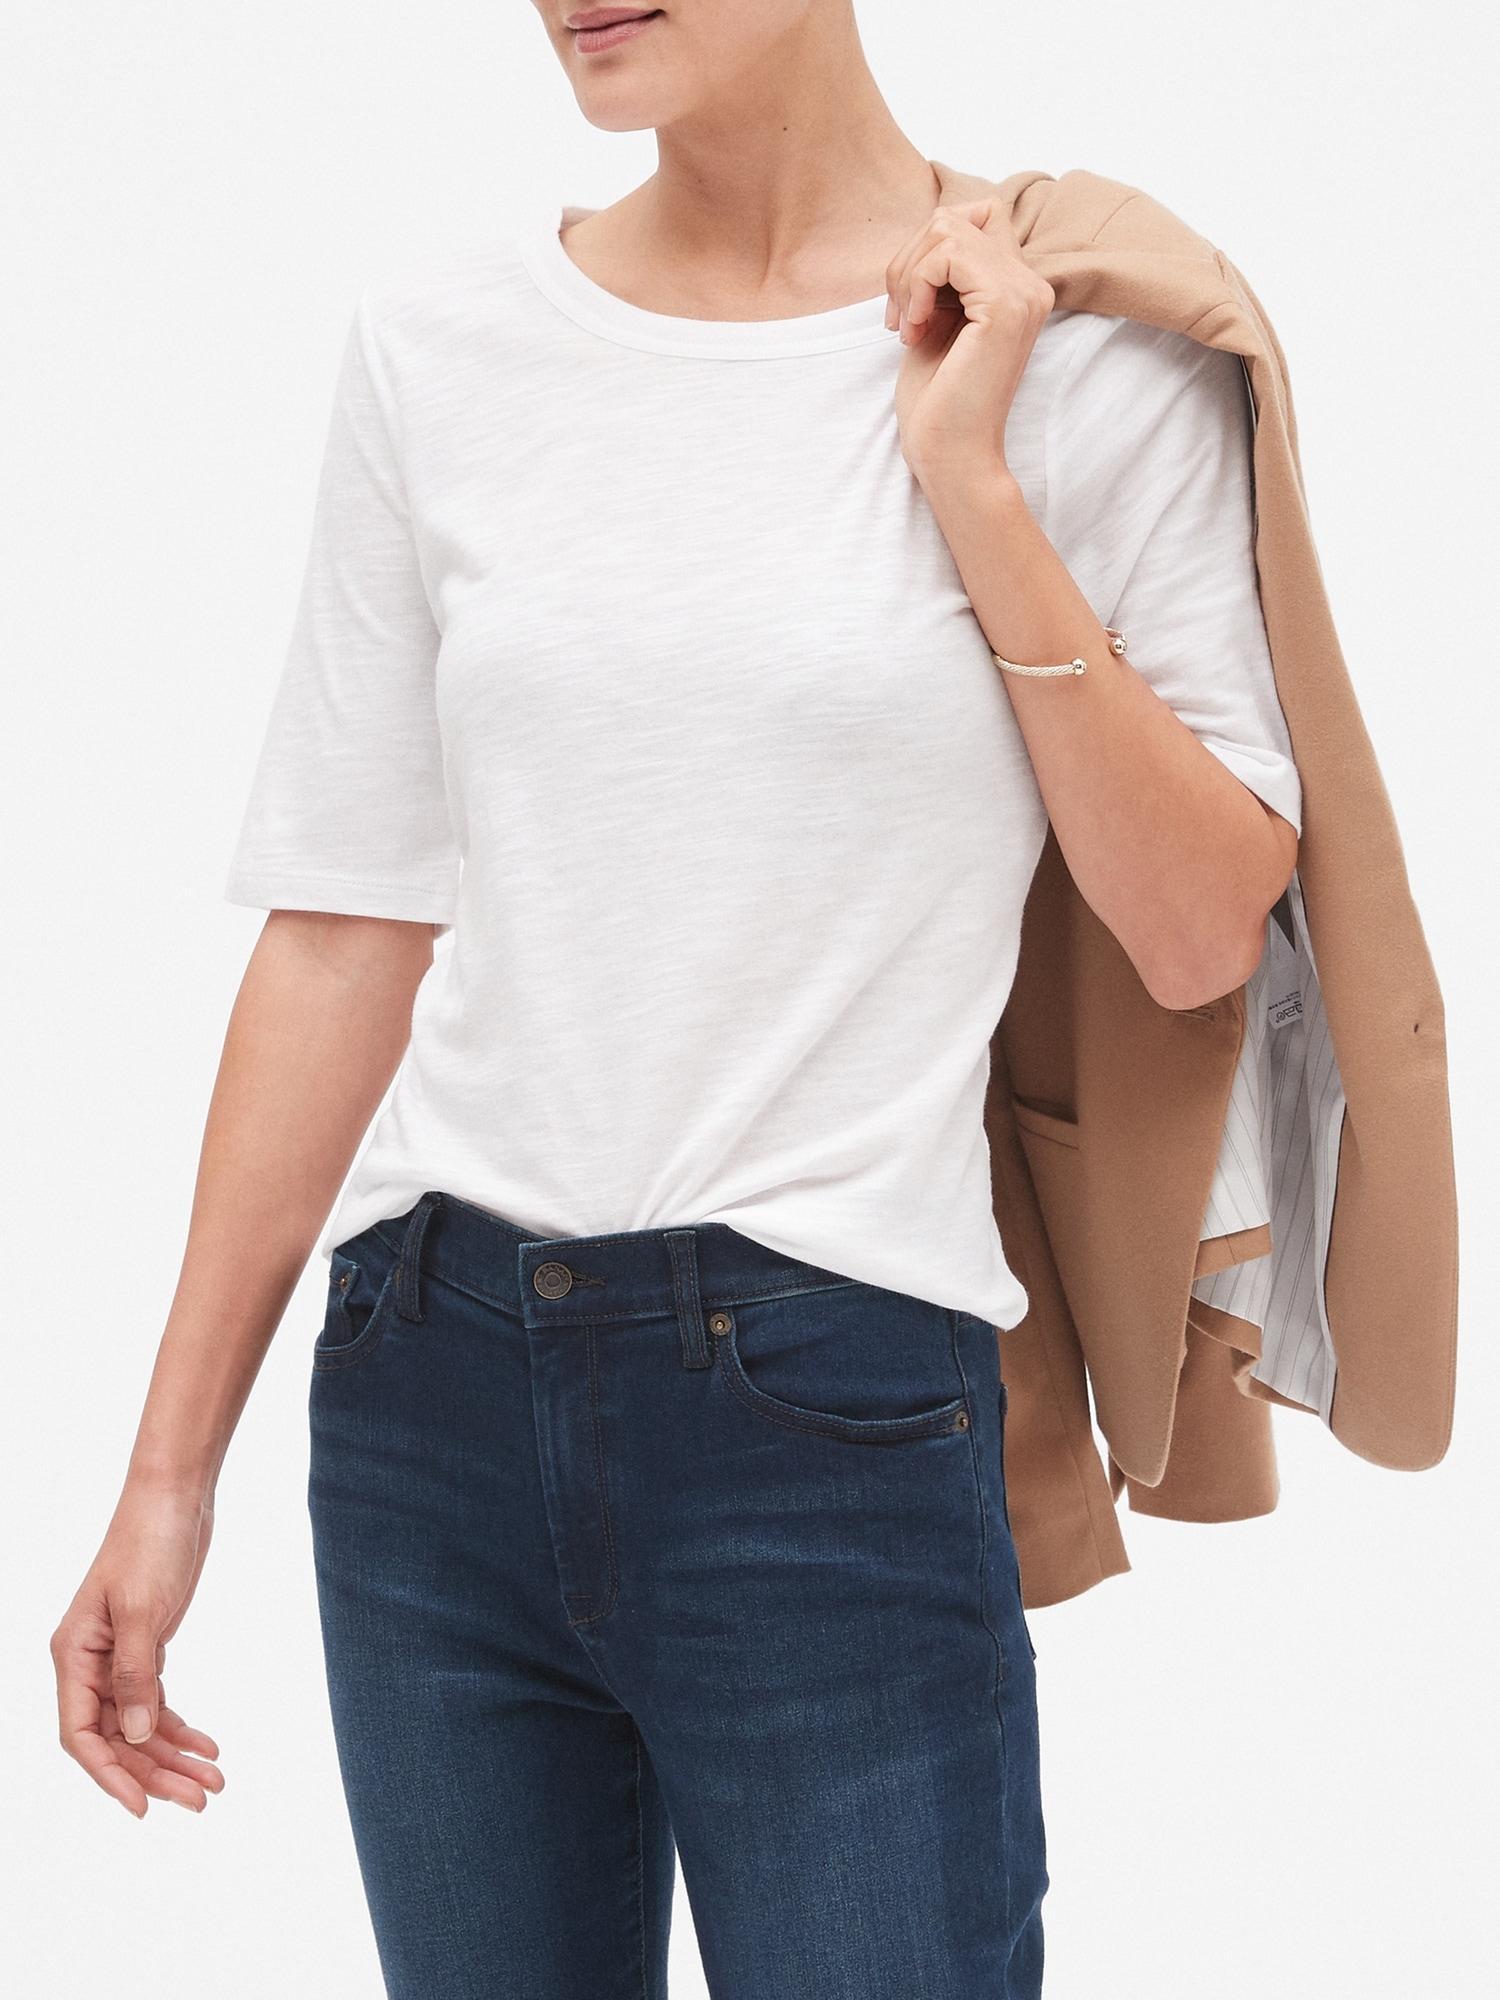 47efc5ab Banana Republic Factory. Women's White Malibu Elbow-sleeve Crew Neck T Shirt